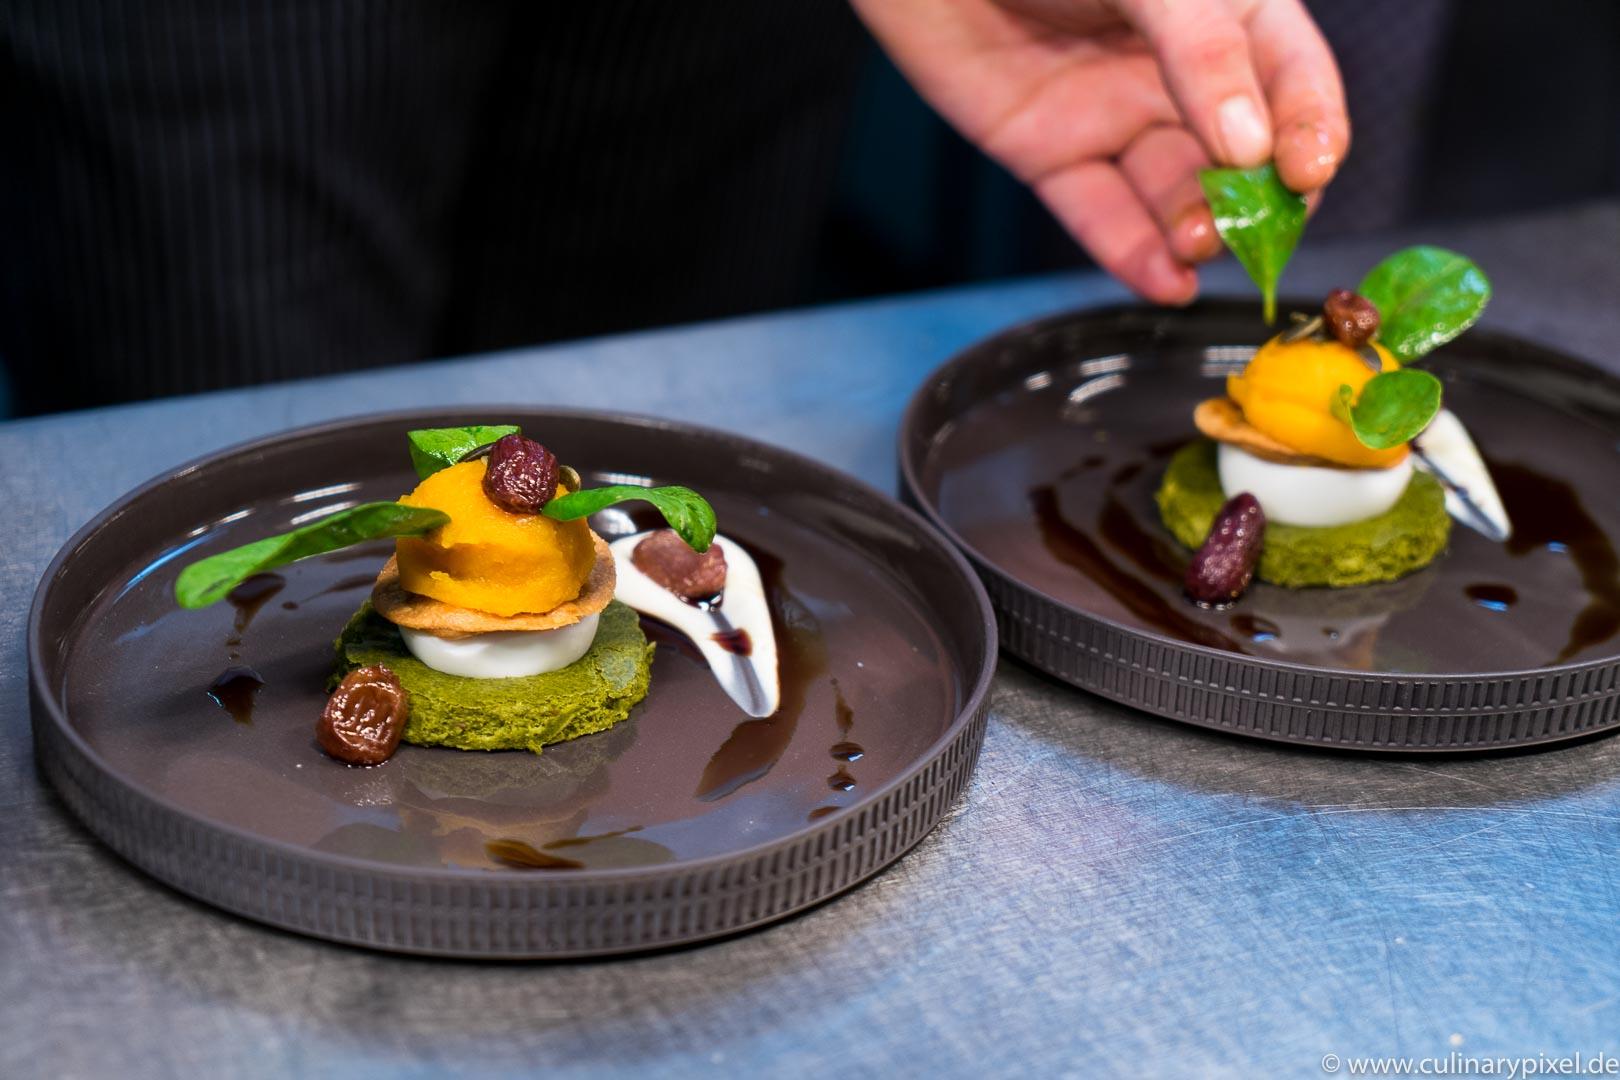 dsc02549 culinary pixel food blog rezepte wein restaurants genuss. Black Bedroom Furniture Sets. Home Design Ideas